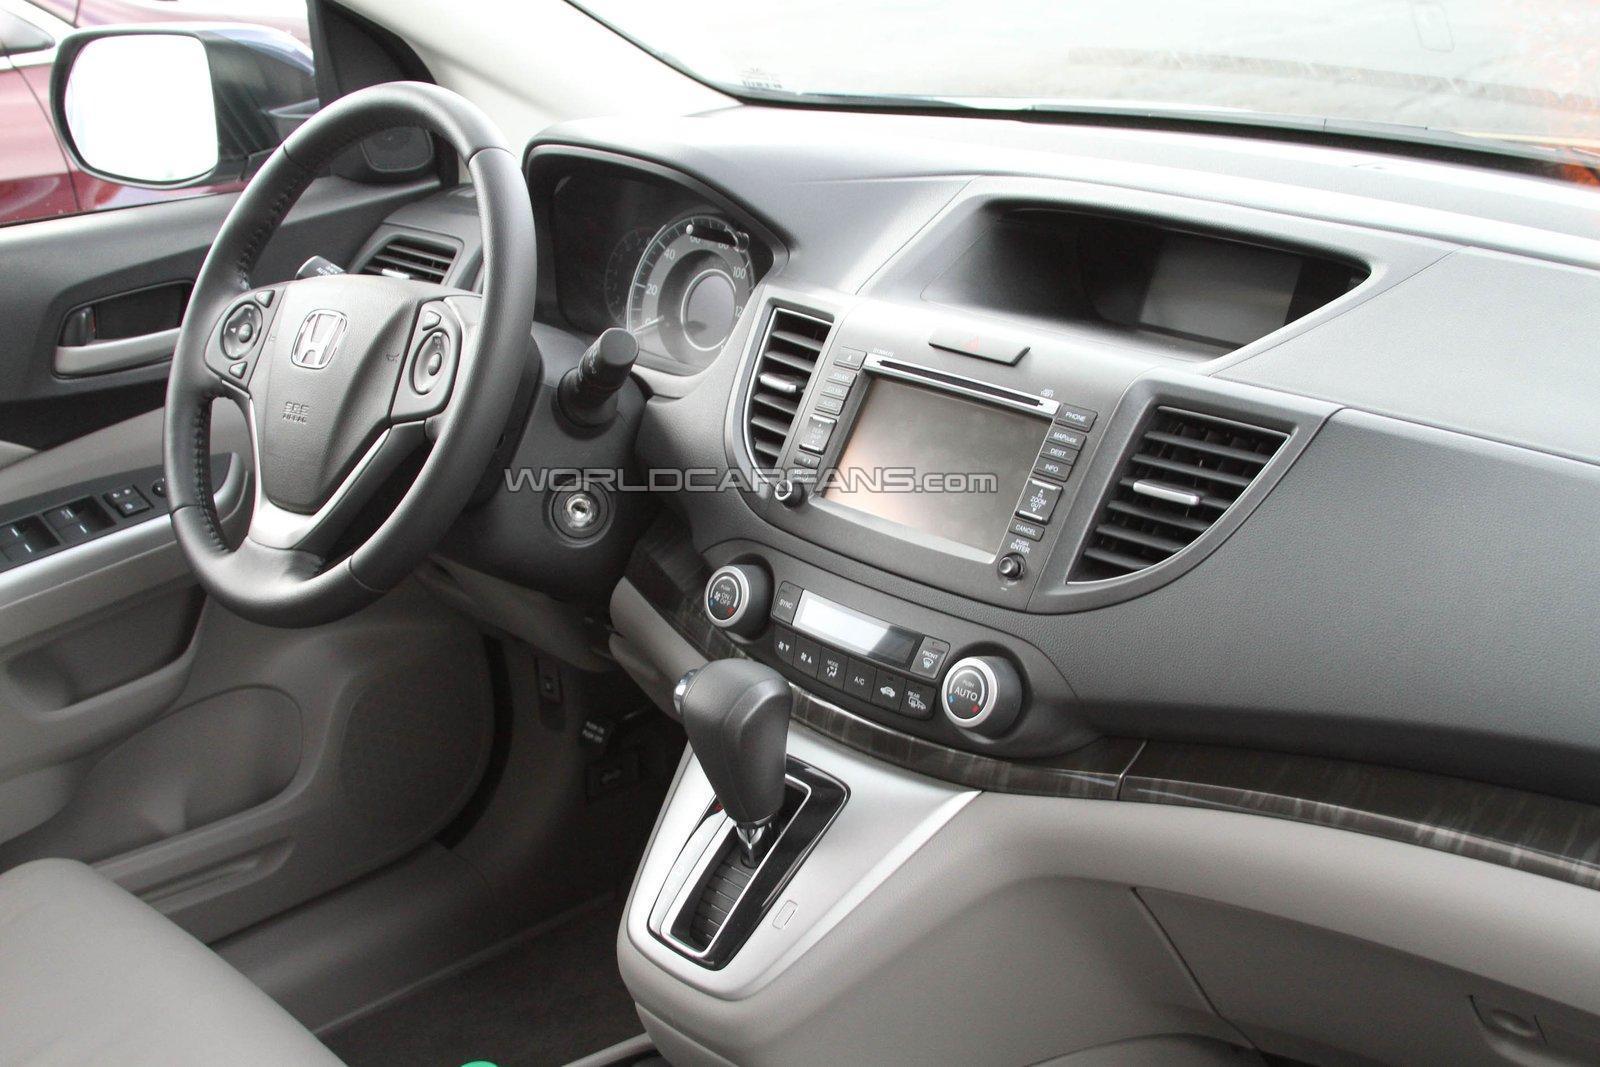 Motor mania buzz spied 2013 honda cr v for Honda cr v 2013 interior